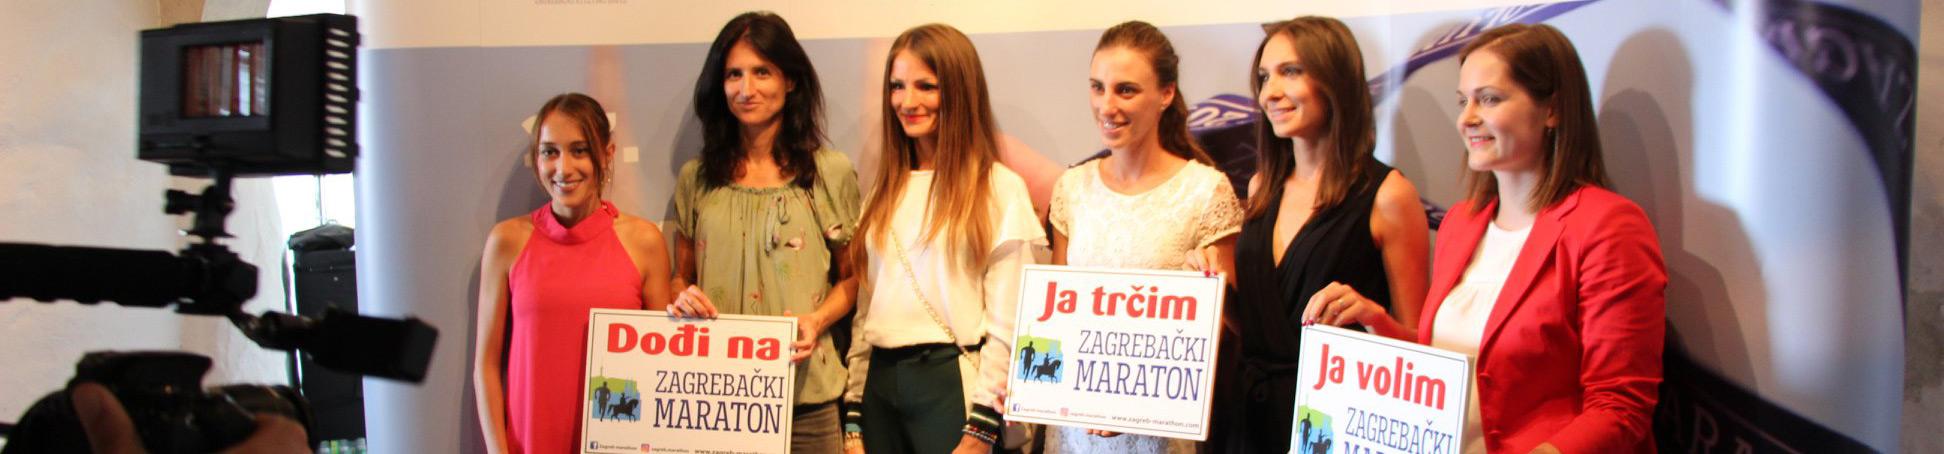 https://www.zagreb-marathon.com/wp-content/uploads/maraton01.jpg